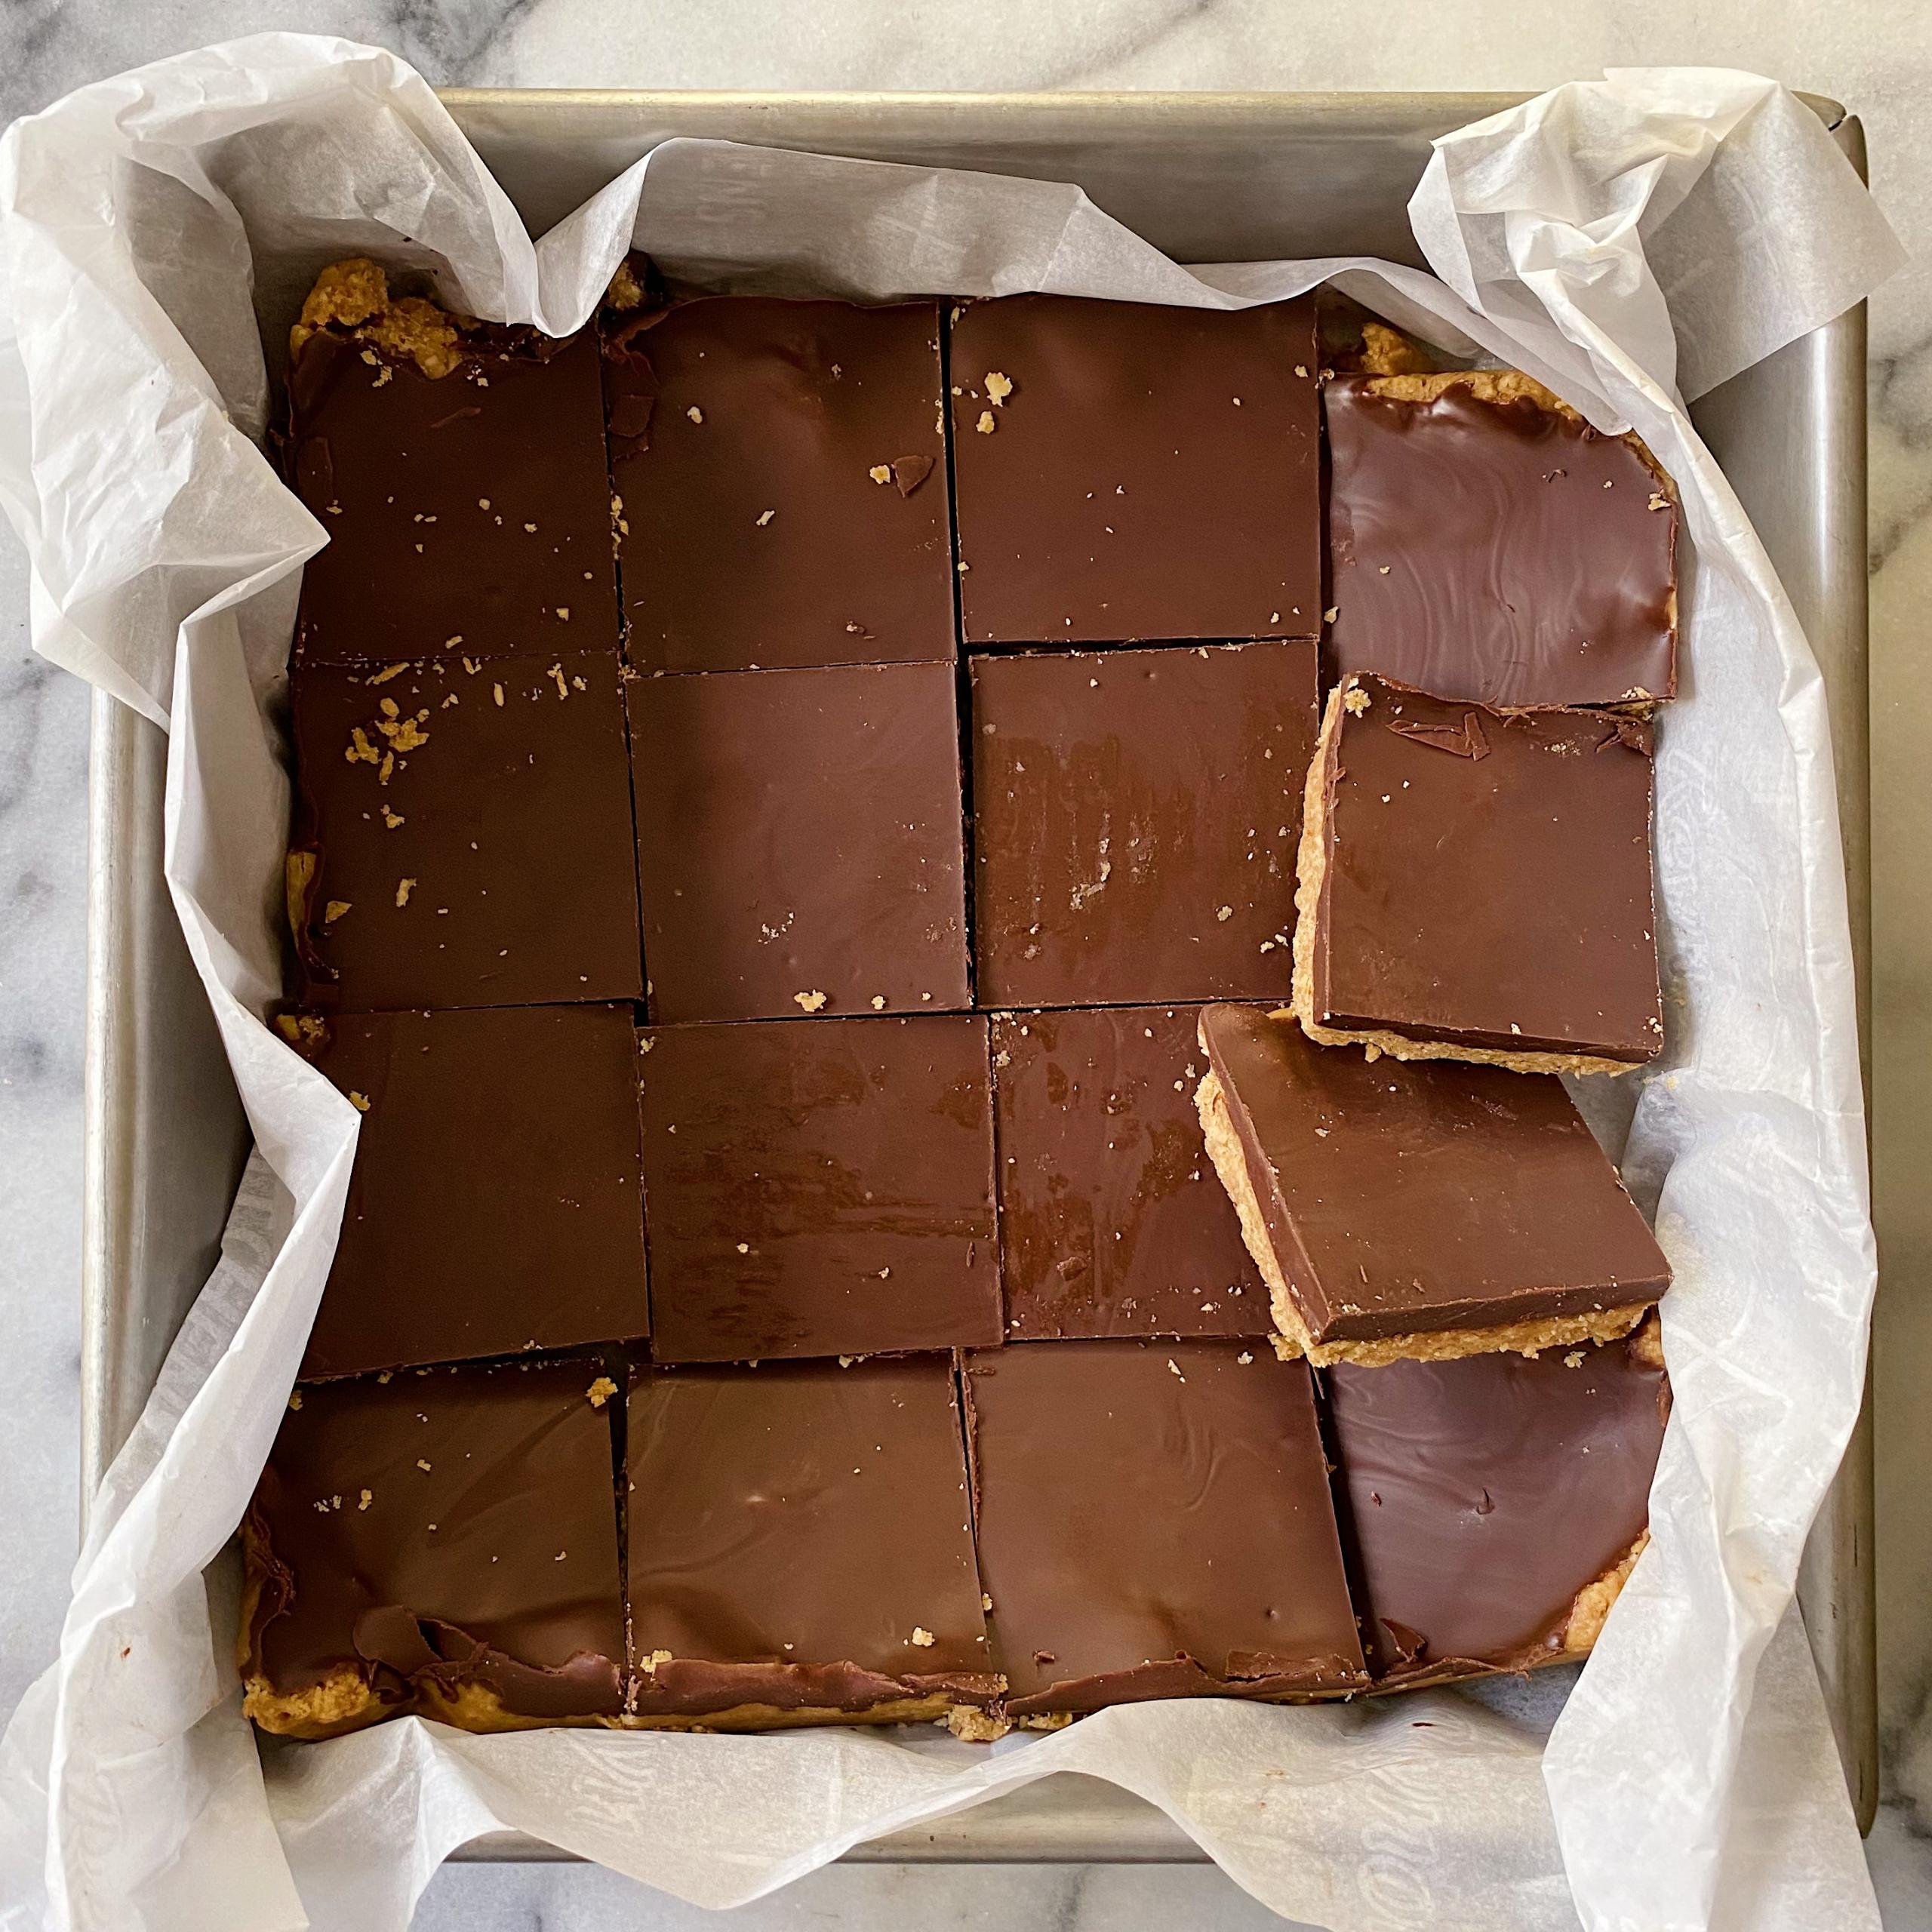 chocolate peanut butter no bake bars gluten free vegan #glutenfree www.healthygffamily.com